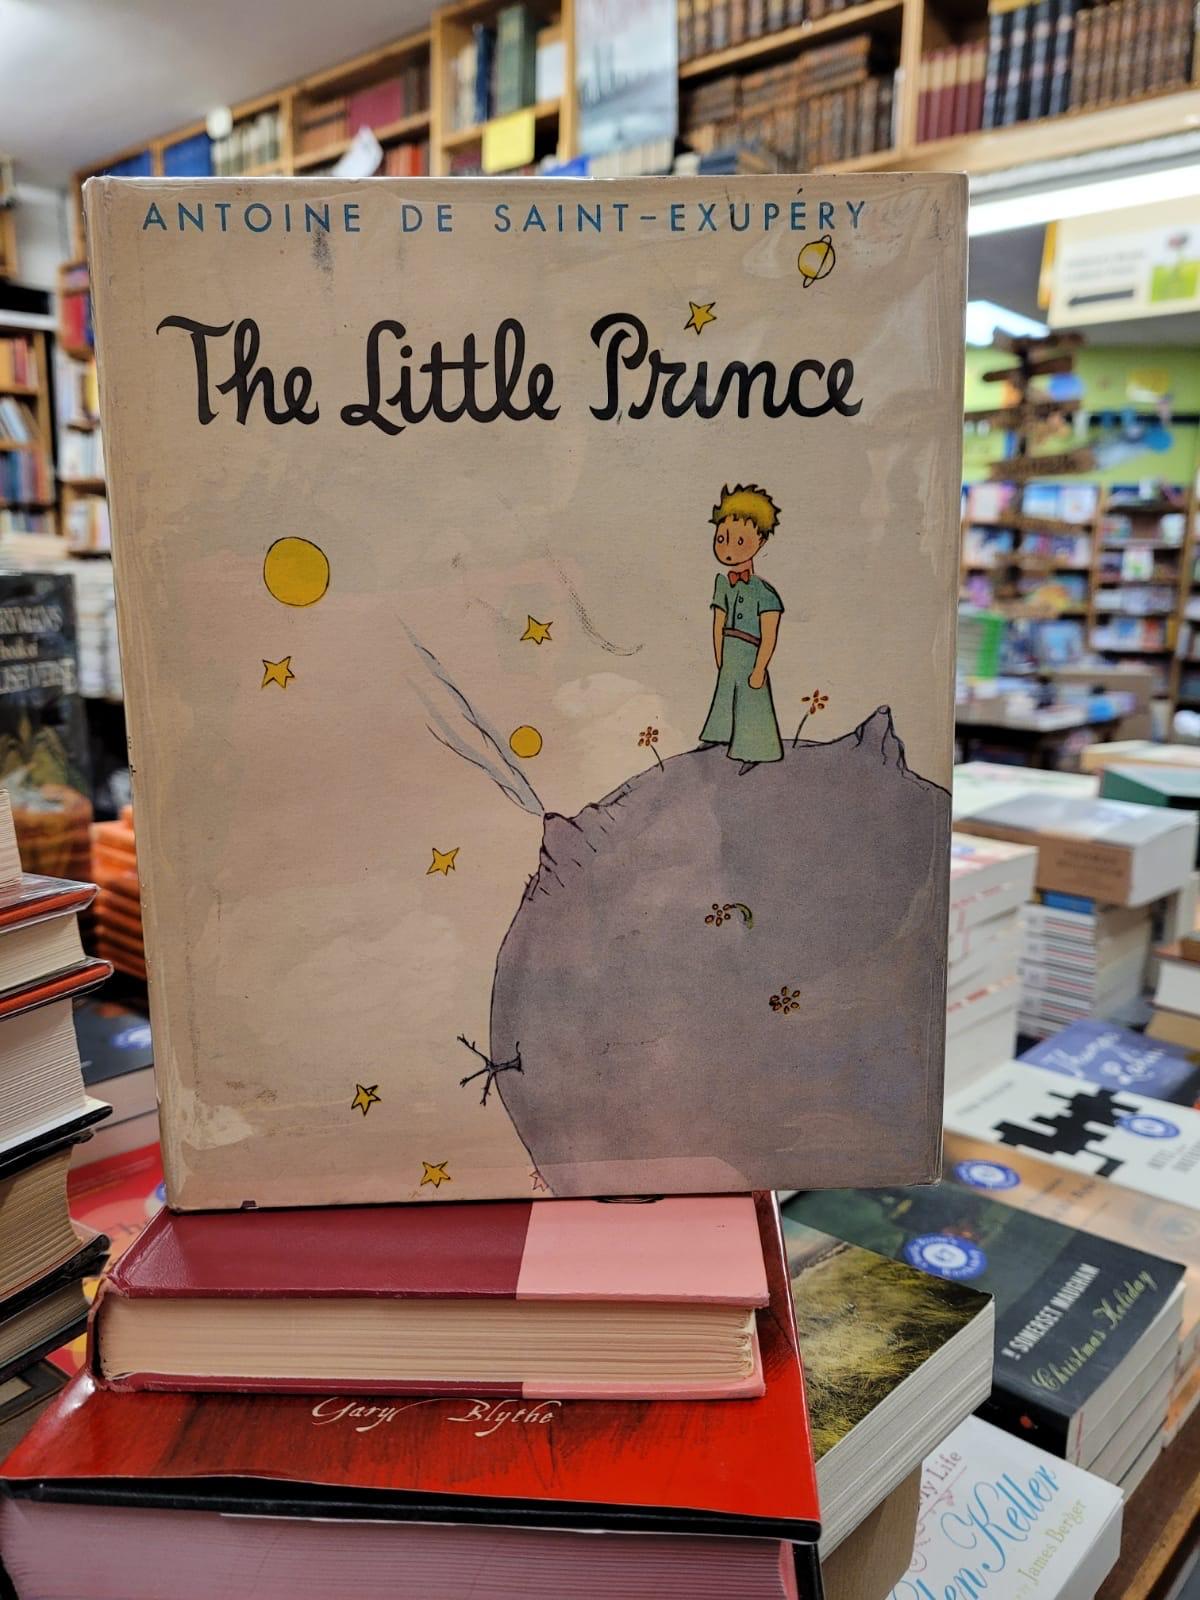 The Little Prince | Antoine de Saint-Exupéry | Charlie Byrne's